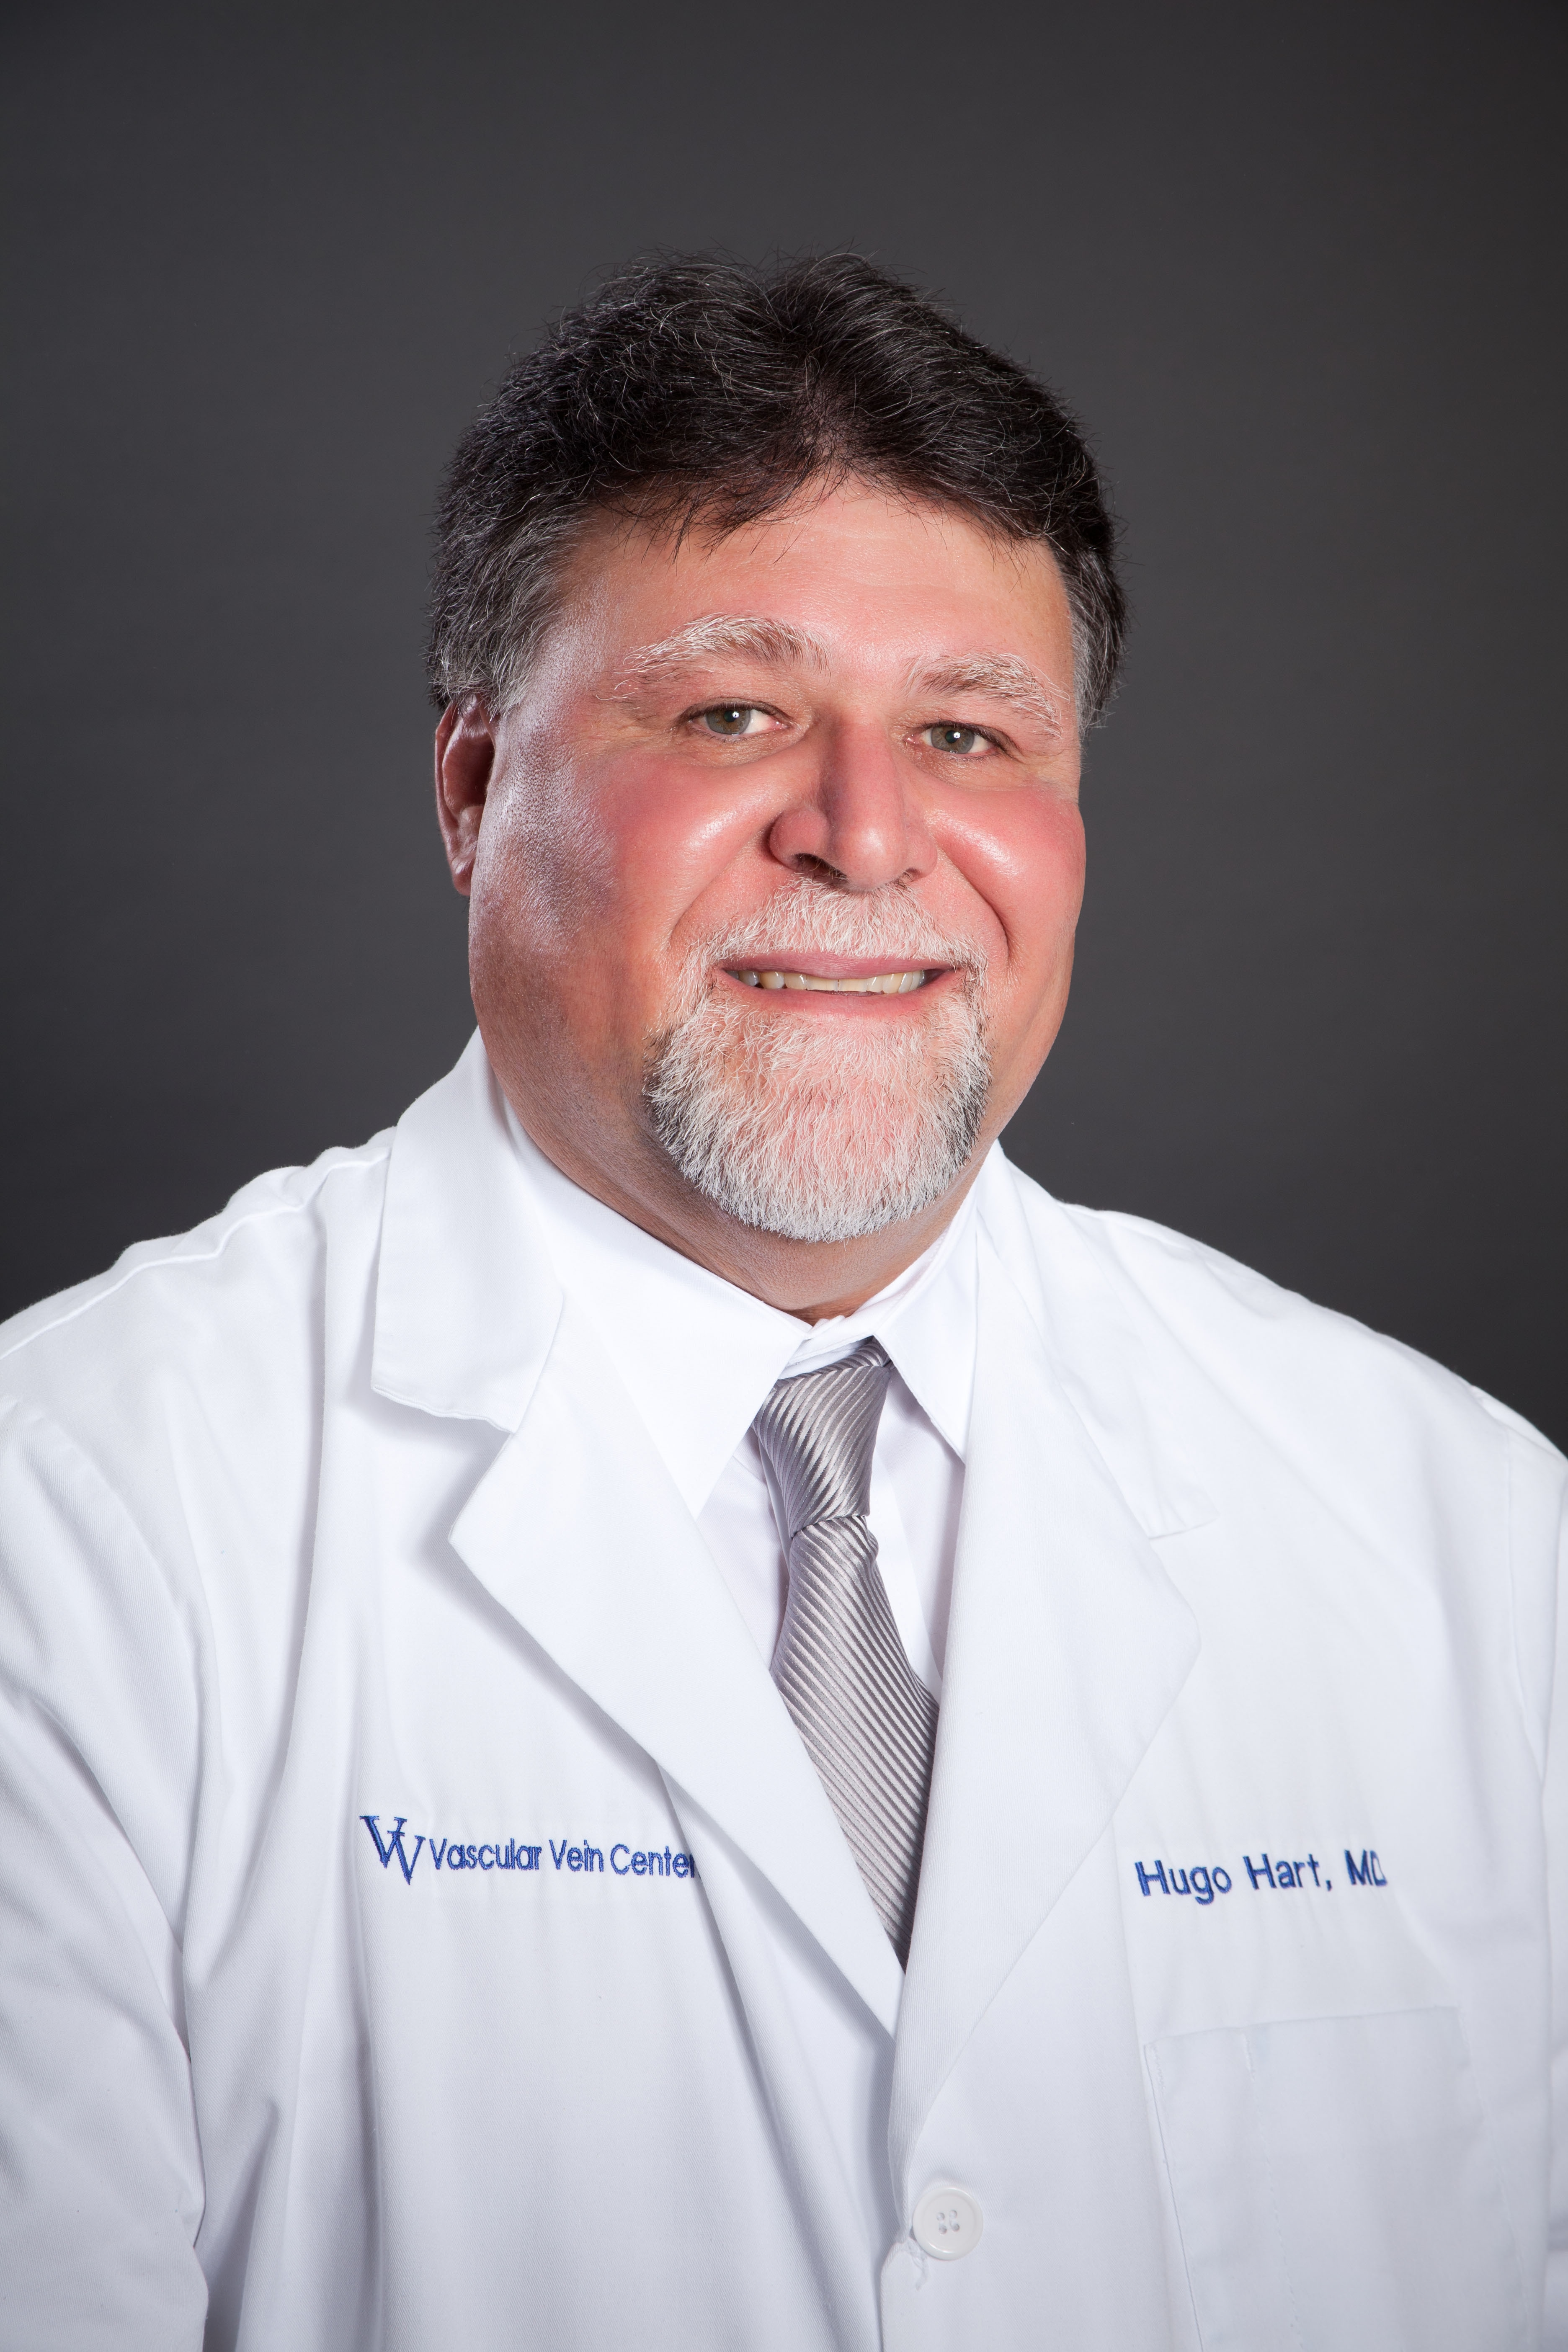 Hugo V. Hart, MD